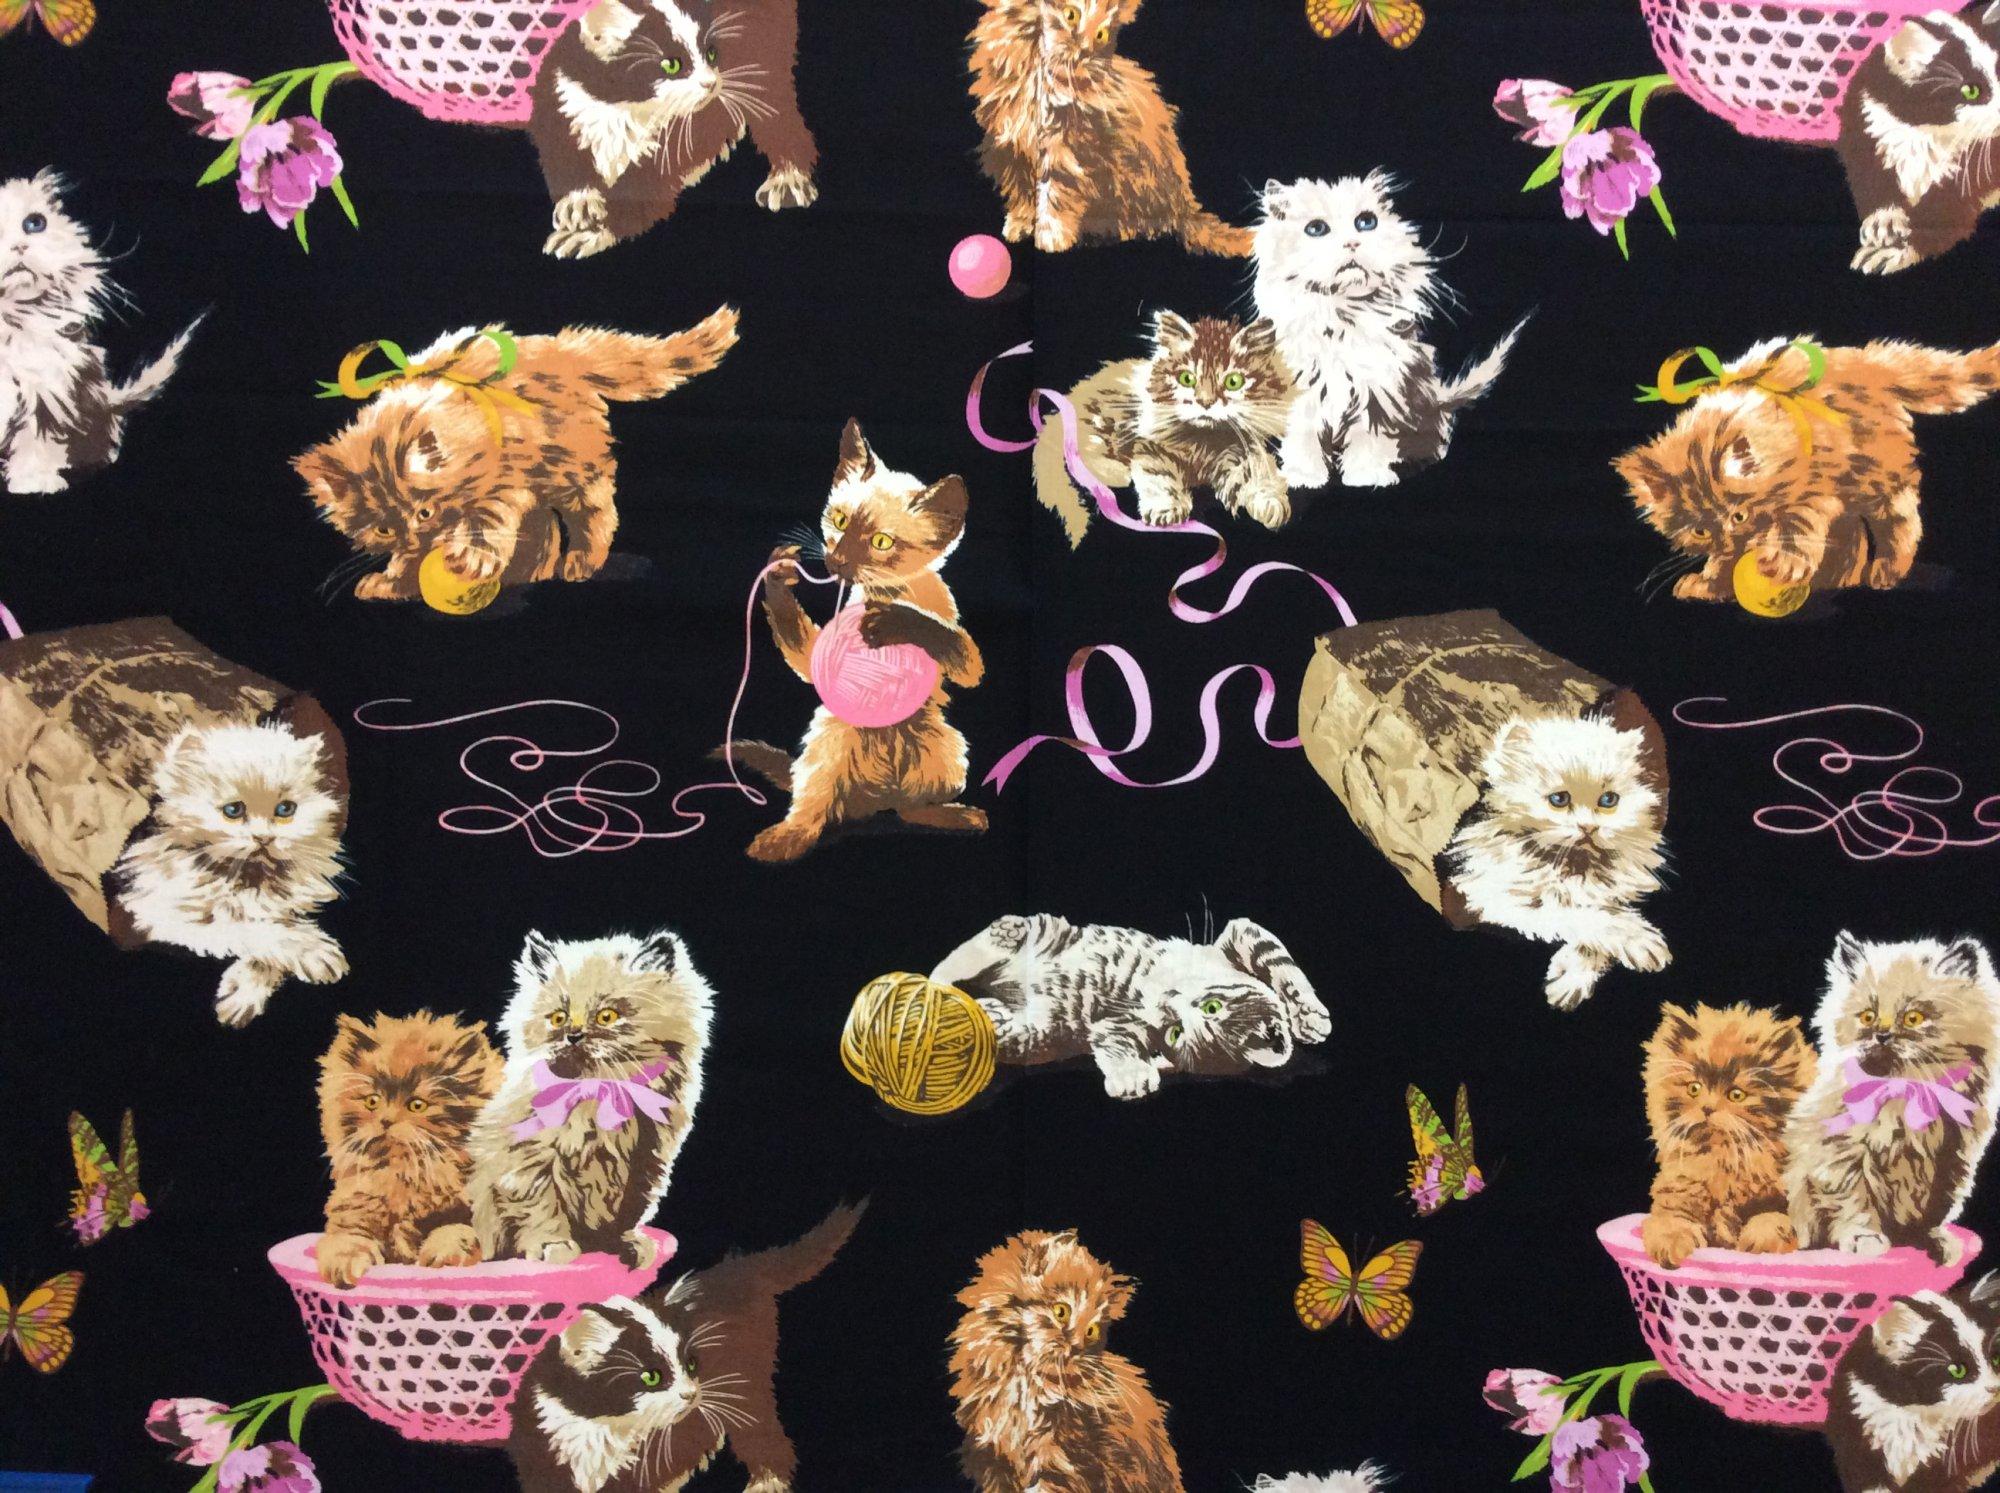 Whats New PussyCat Rare Out of Print Alexander Henry Cat Fabric Kitten Cotton Quilt Fabric AH348